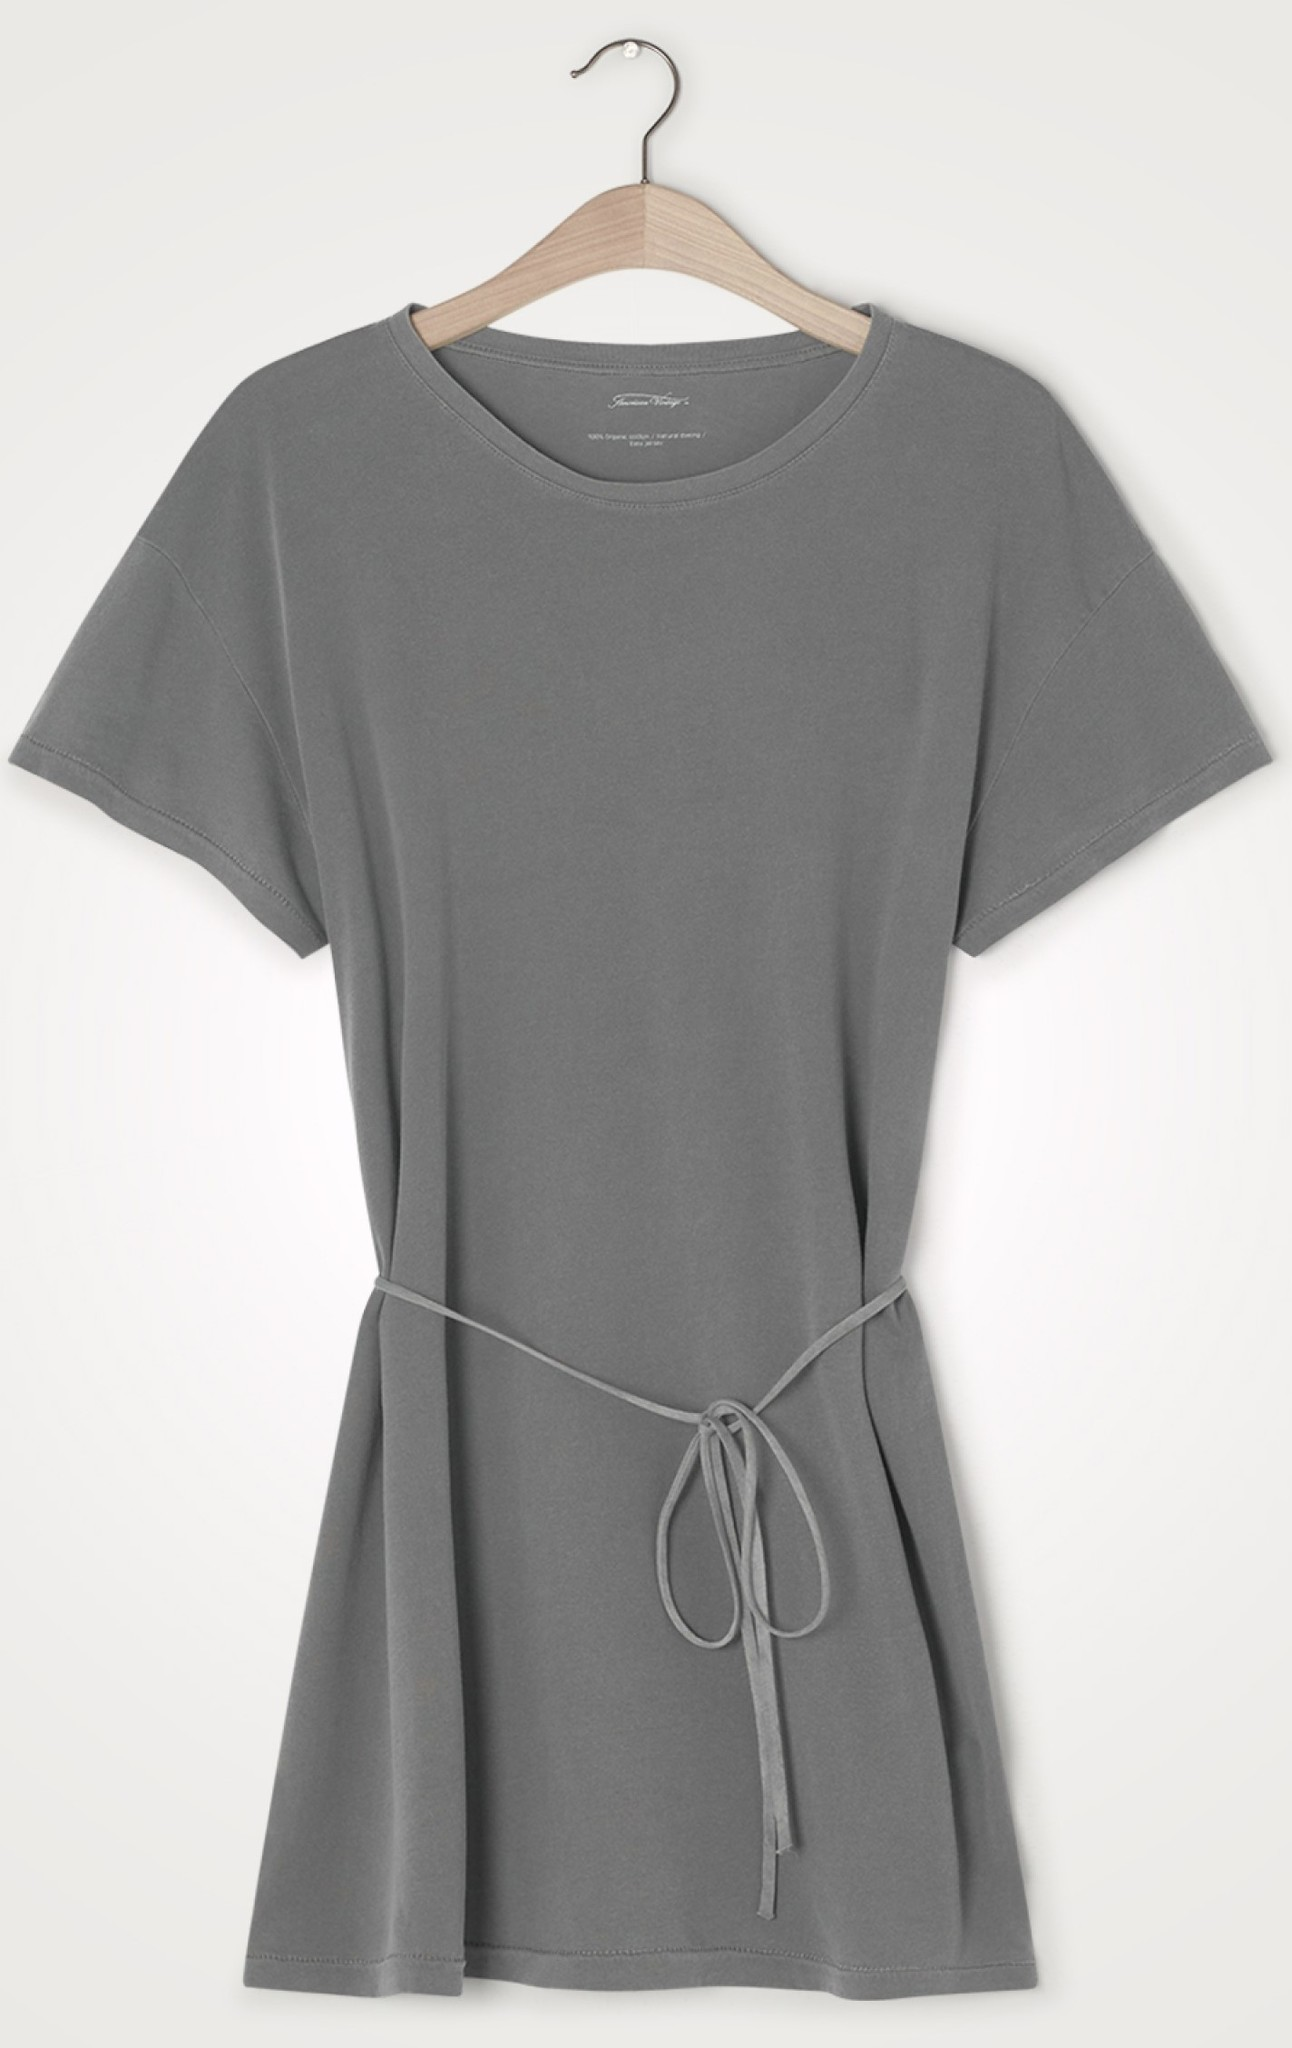 T-shirt long Vegiflower metal-1